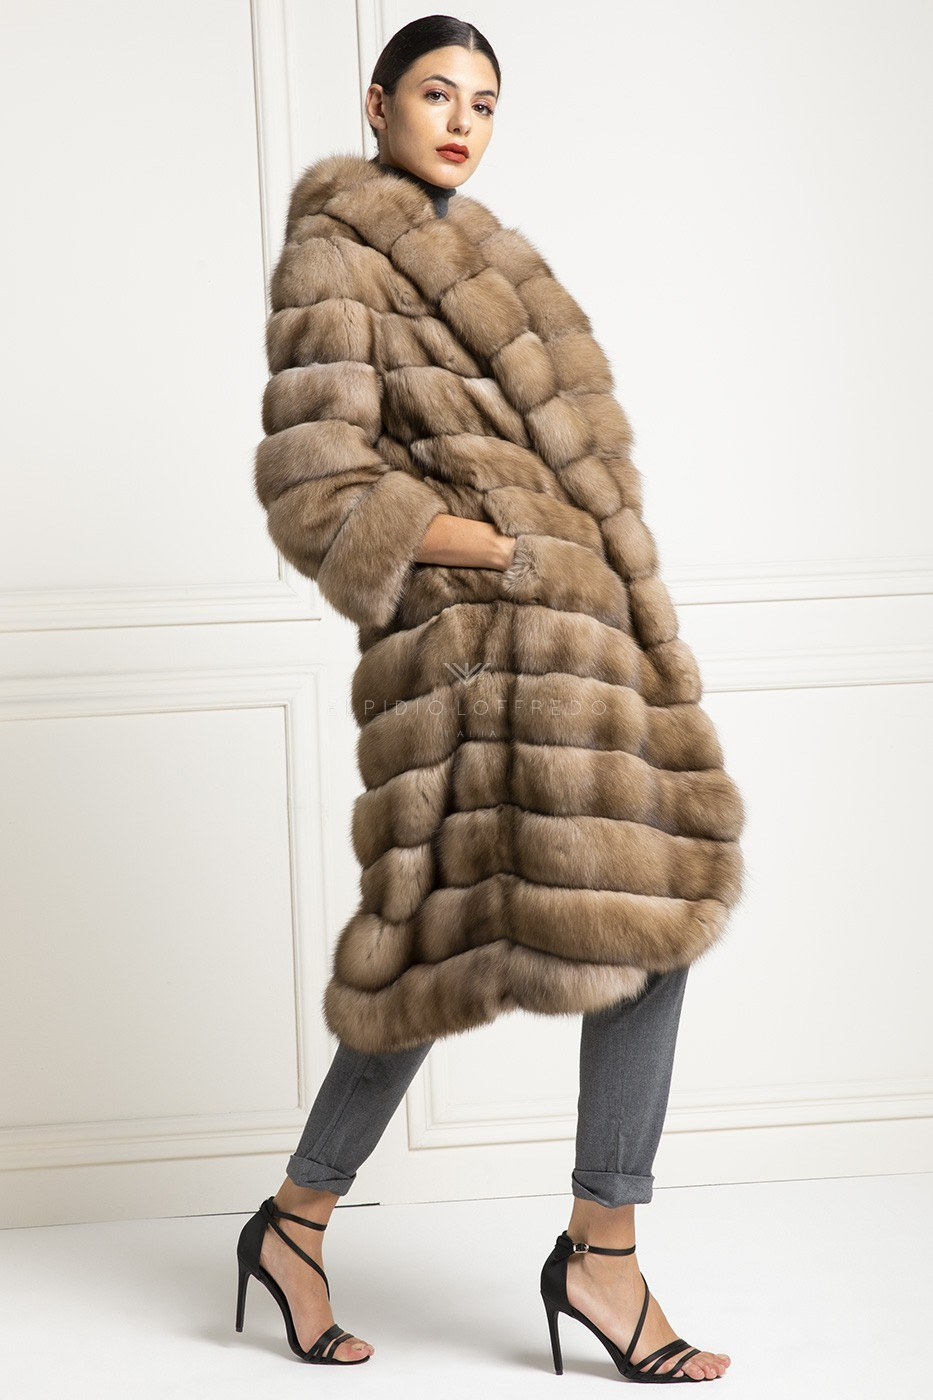 Barguzinsky Russian Sable Fur Coat - Titanio Color - Length 115 cm